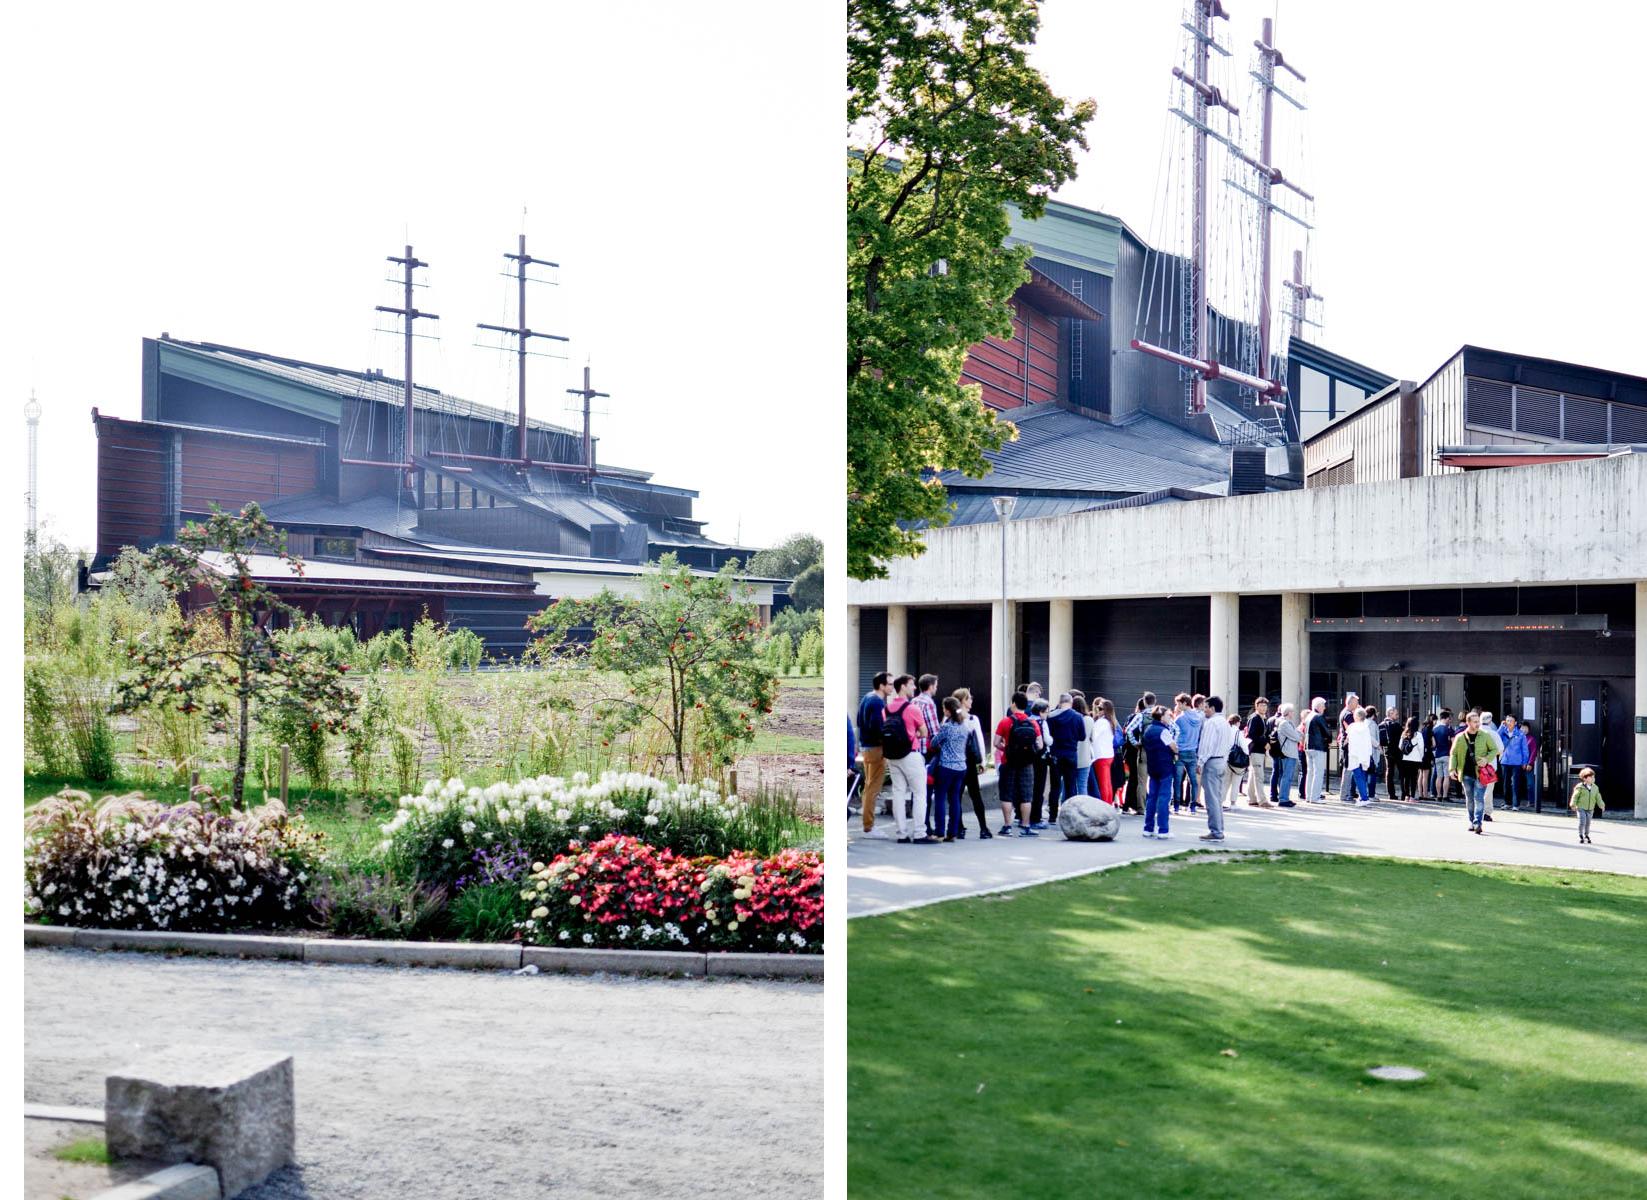 3-tourism-stockholm-vasa-museum-1-i-scandinavia-standard